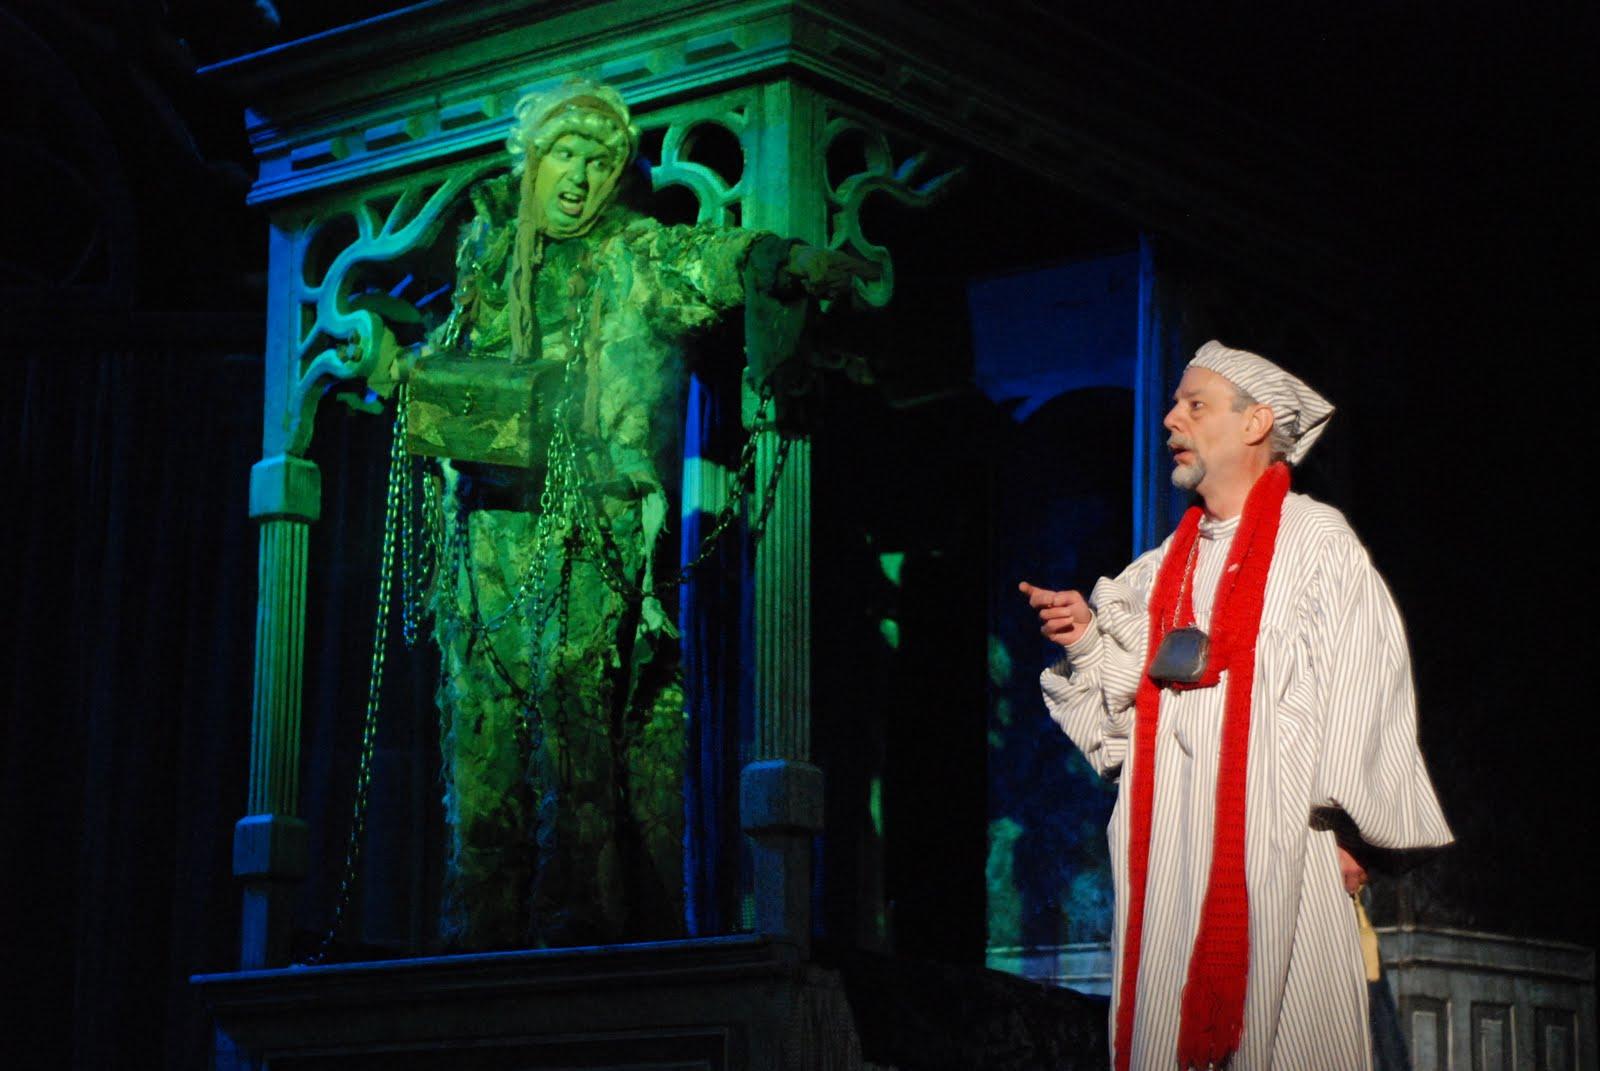 'A Christmas Carol' to be Presented at Pitt-Bradford December 7